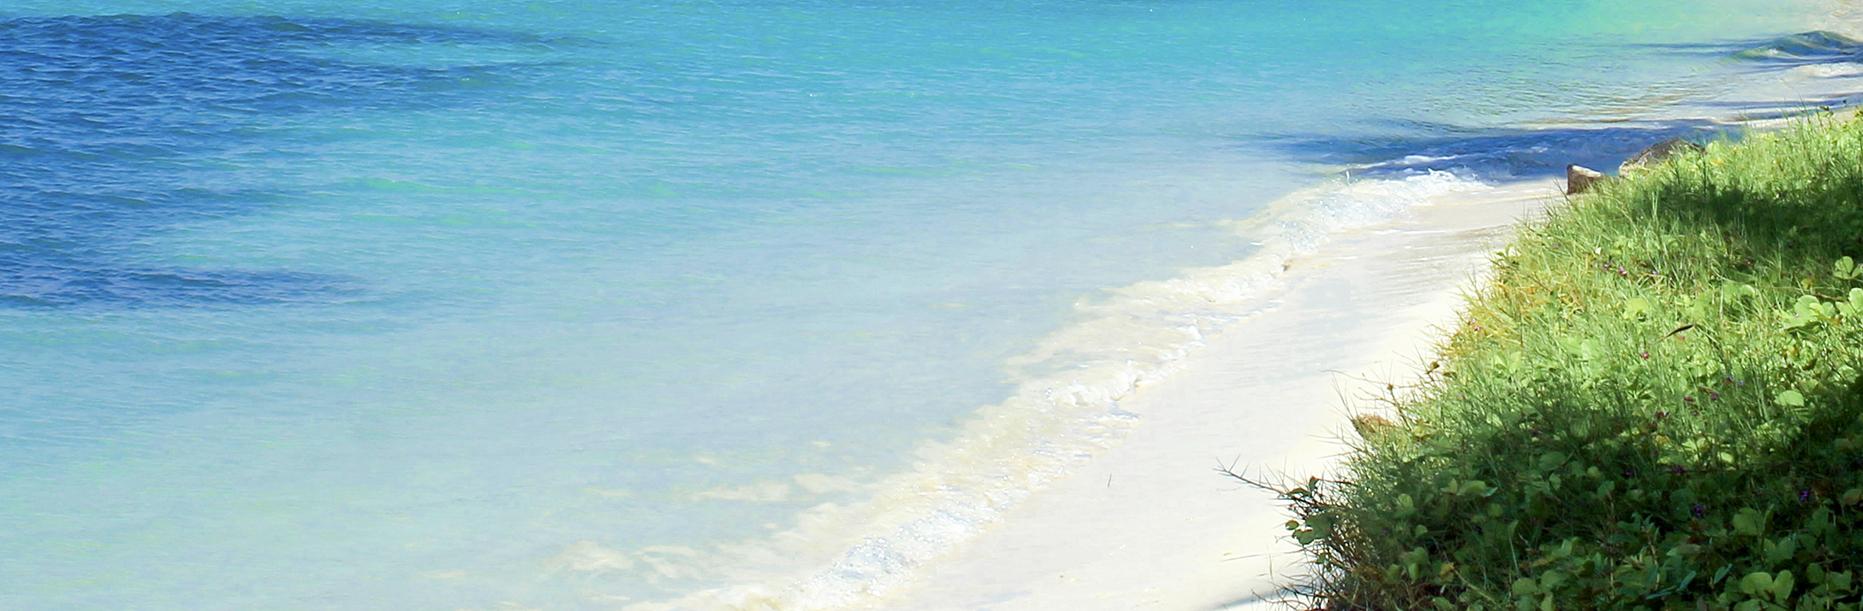 Centroamérica, premio a la excelencias turísticas en FITUR